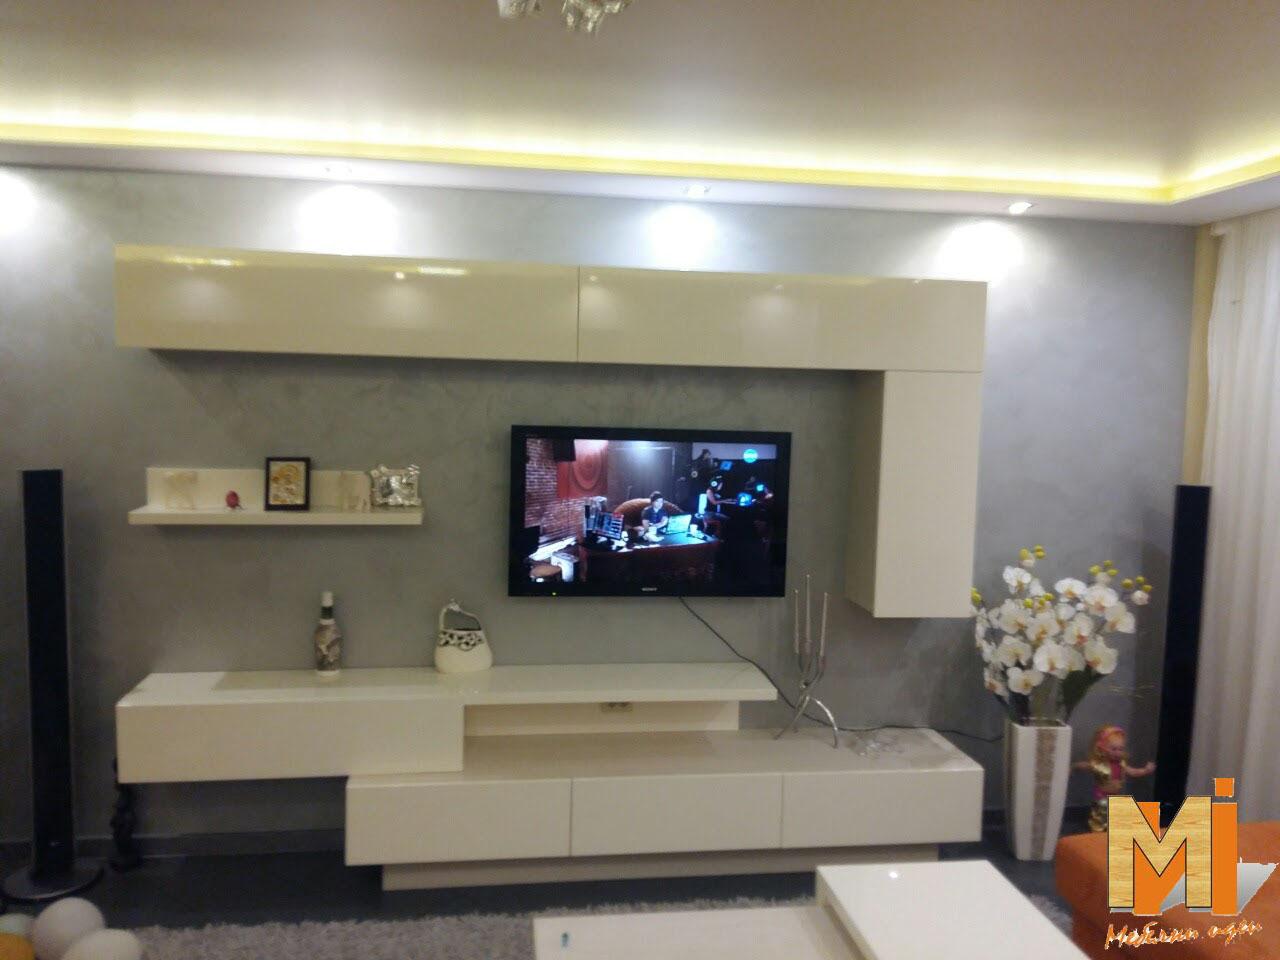 TV_holna_masa_MDF_boia_glanc_7